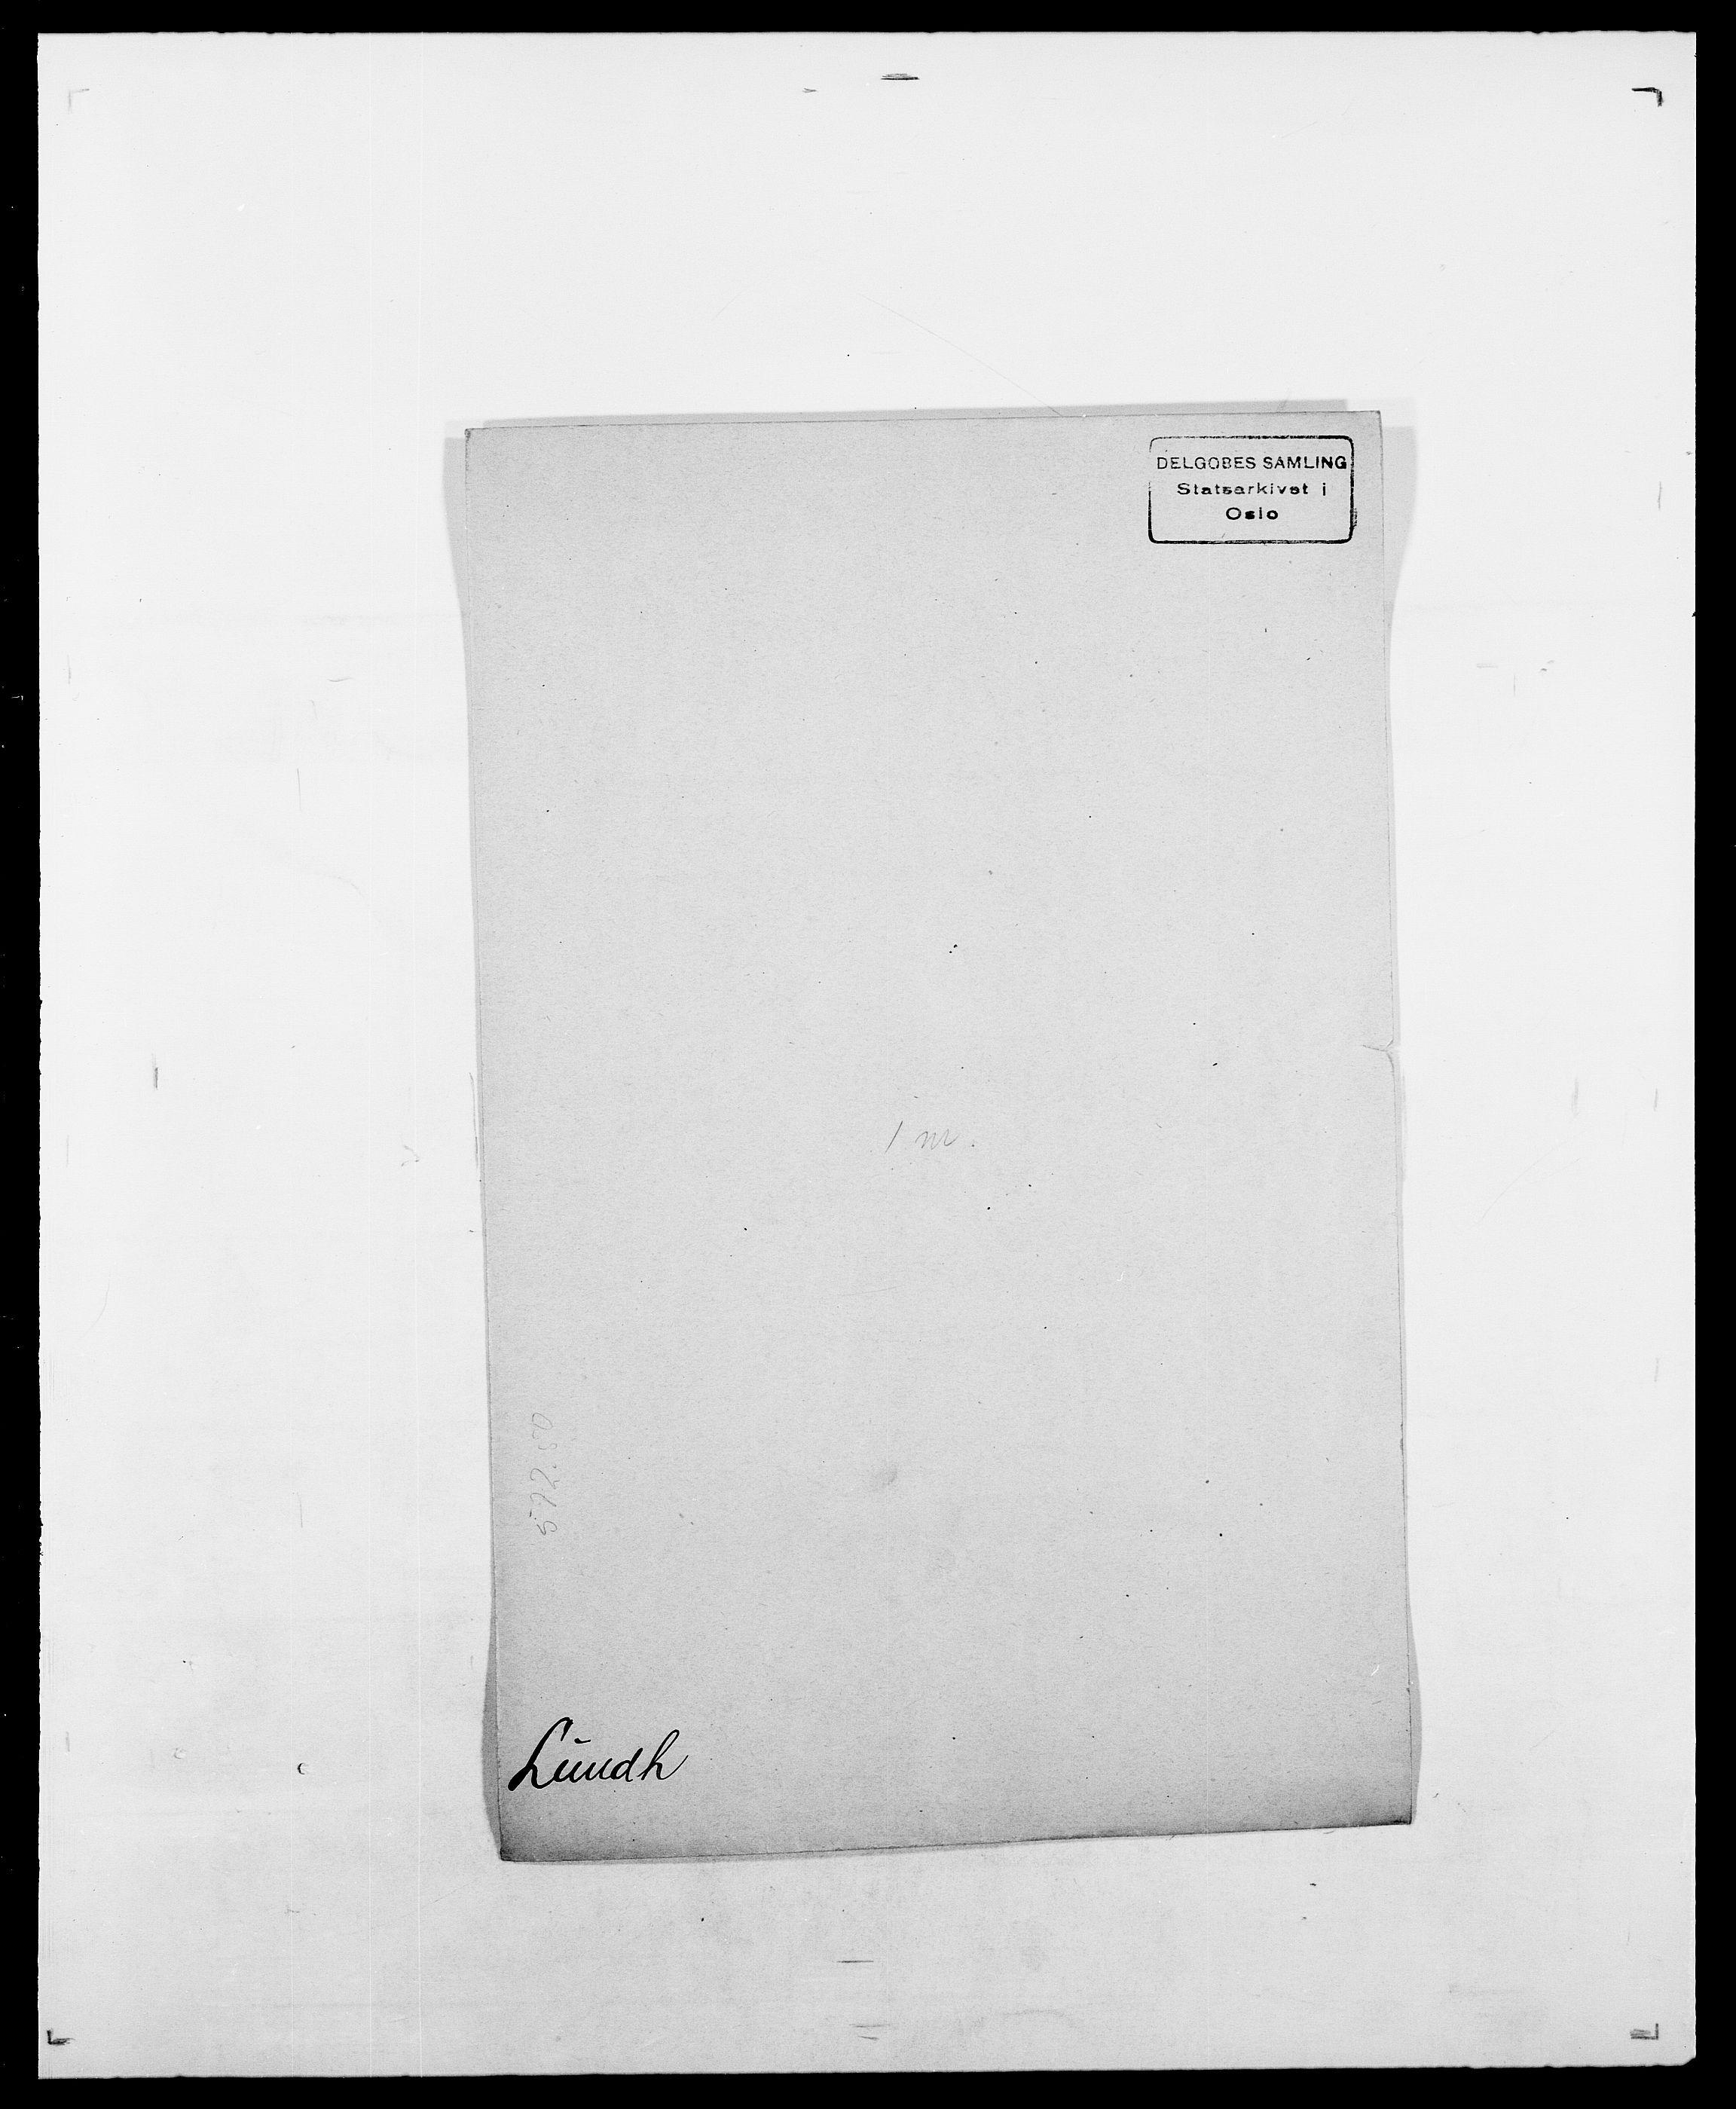 SAO, Delgobe, Charles Antoine - samling, D/Da/L0024: Lobech - Lærum, s. 647